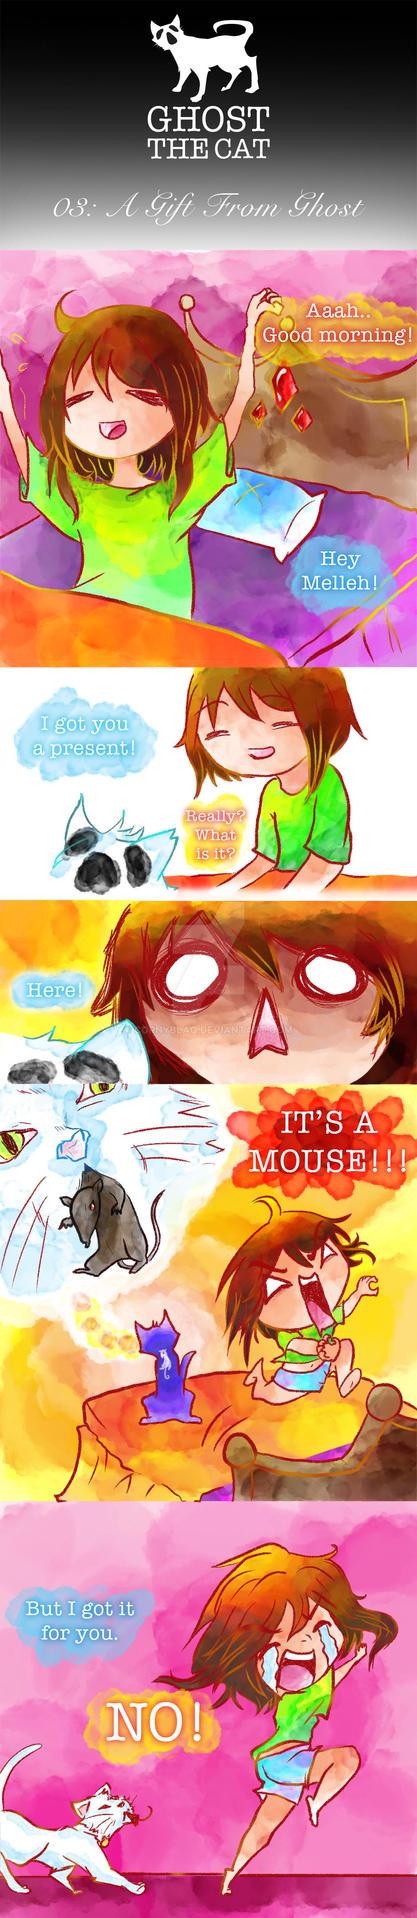 Ghost the cat comics 03 by cornyblaq